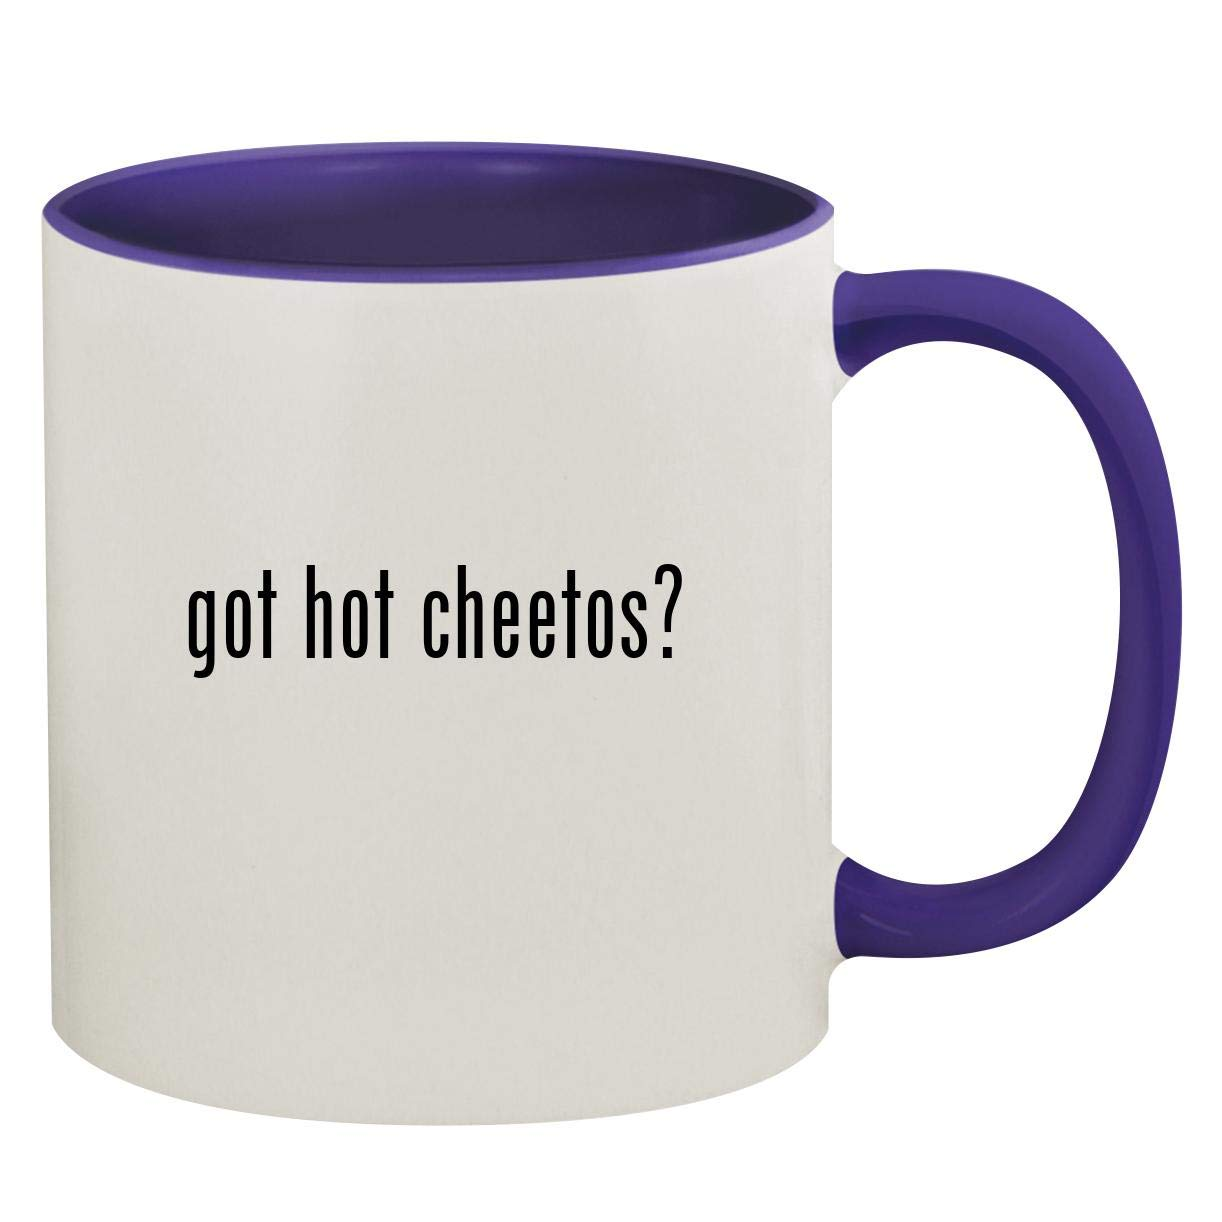 got hot cheetos? - 11oz Ceramic Colored Inside & Handle Coffee Mug, Deep Purple